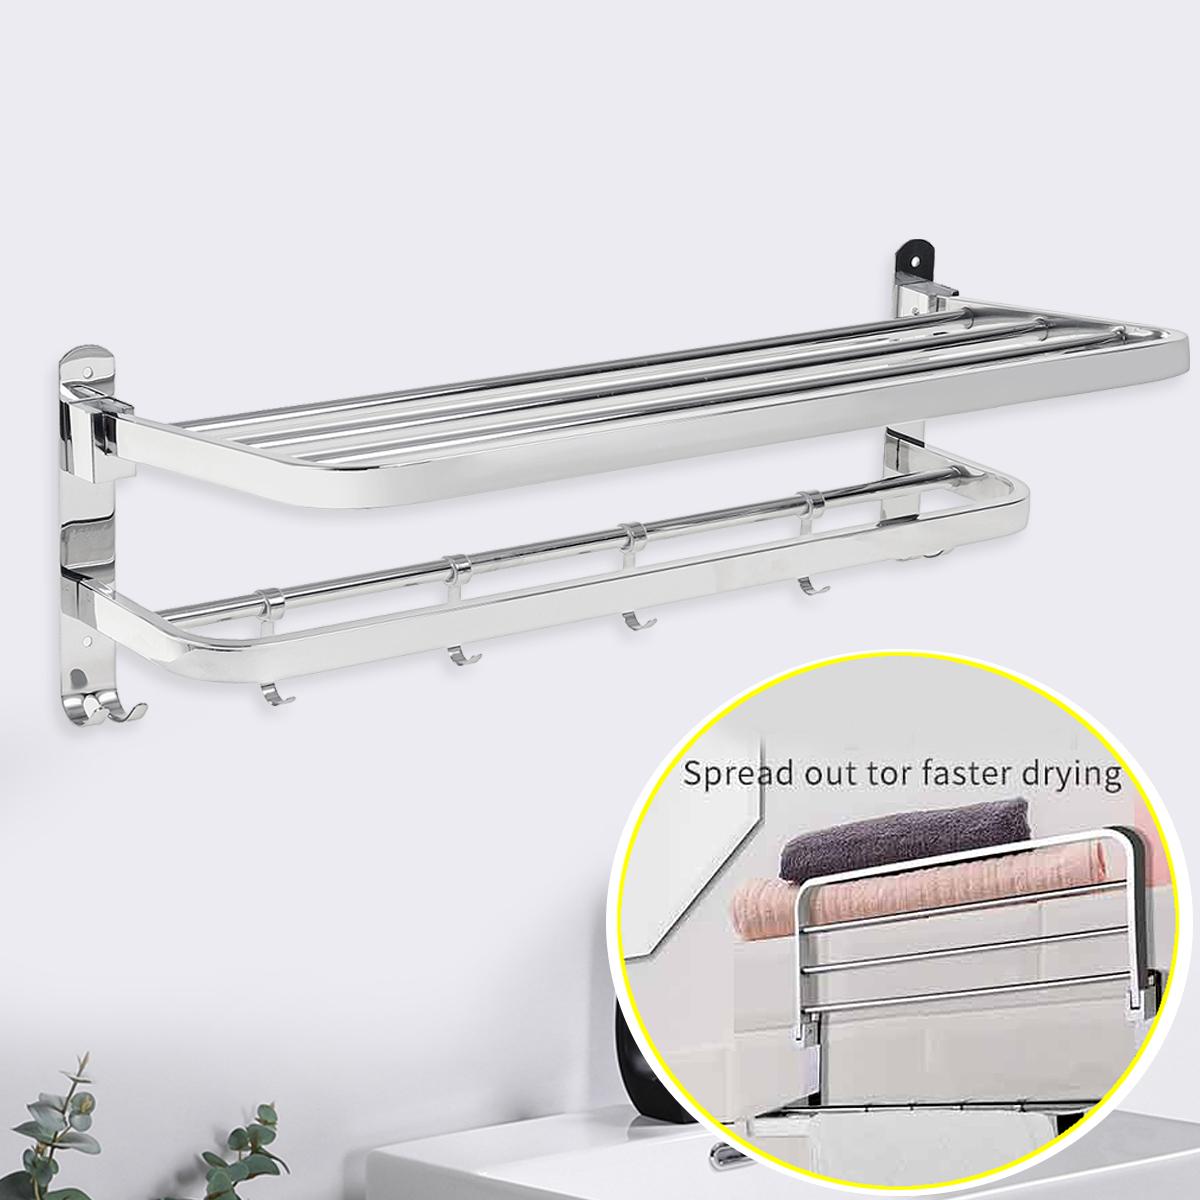 double towel bar 24 inch stainless steel hanging towel bar hotel shower towel rack bathroom towel holder wall mount storage shelf bath organizer